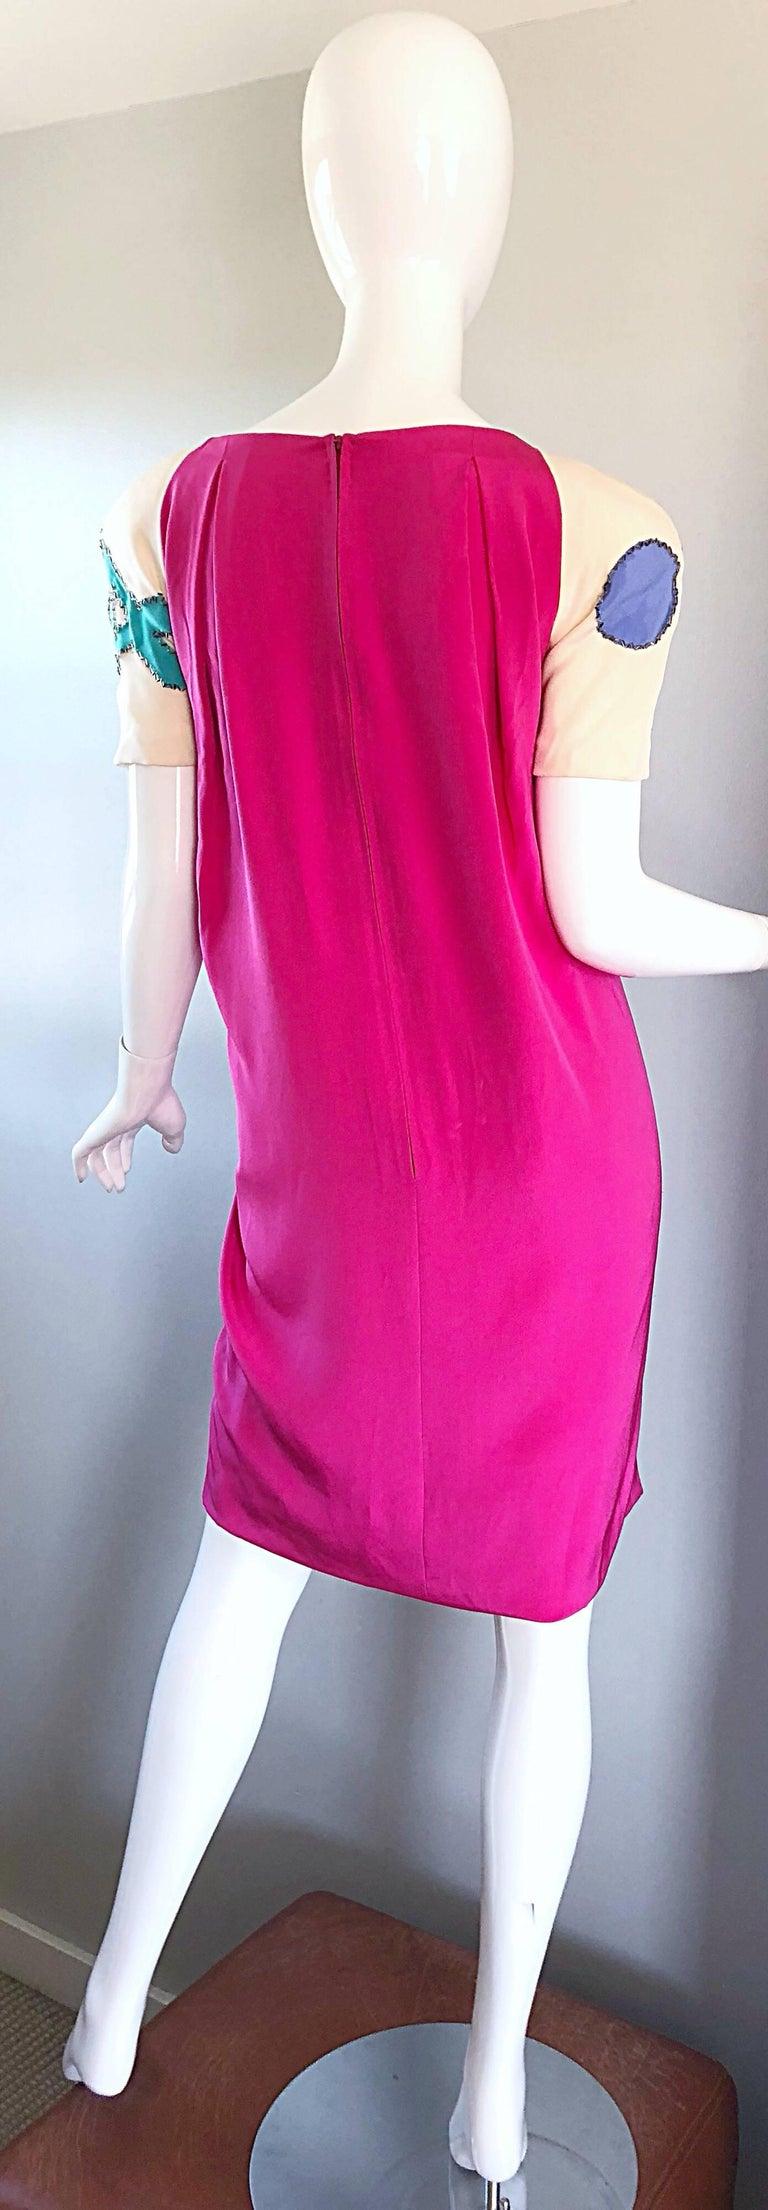 Vintage Bob Mackie Size 12 / 14 Hot Pink Ivory 1990s Short Sleeve 90s Silk Dress For Sale 1